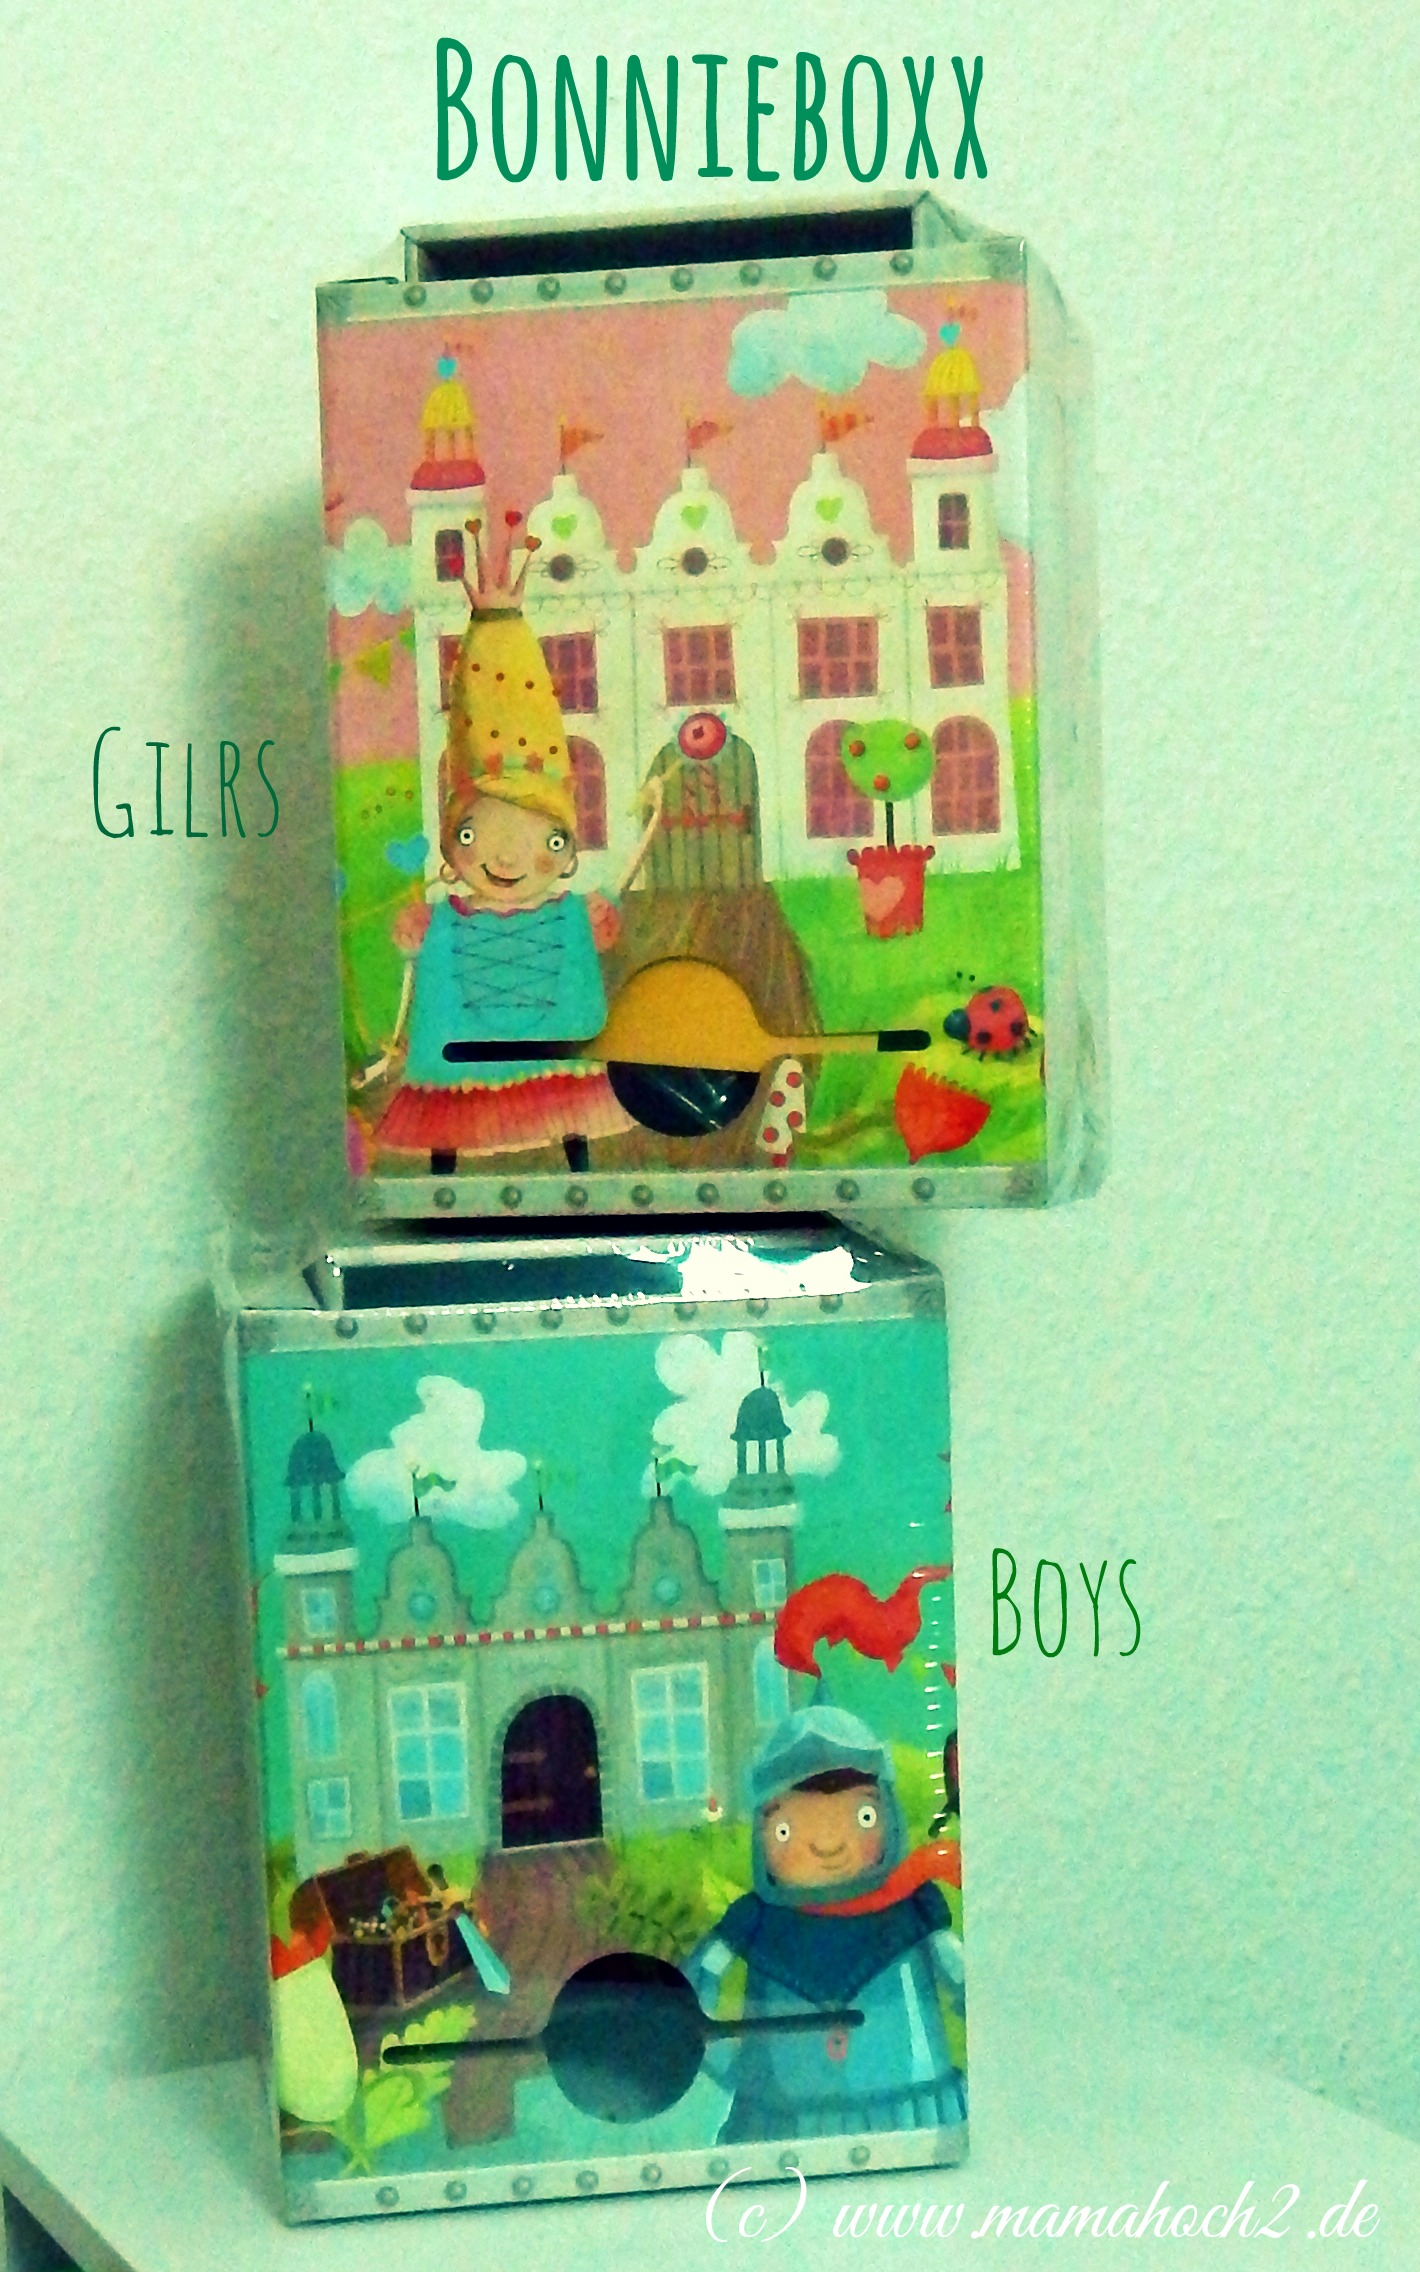 bonnieboxx girls and boys